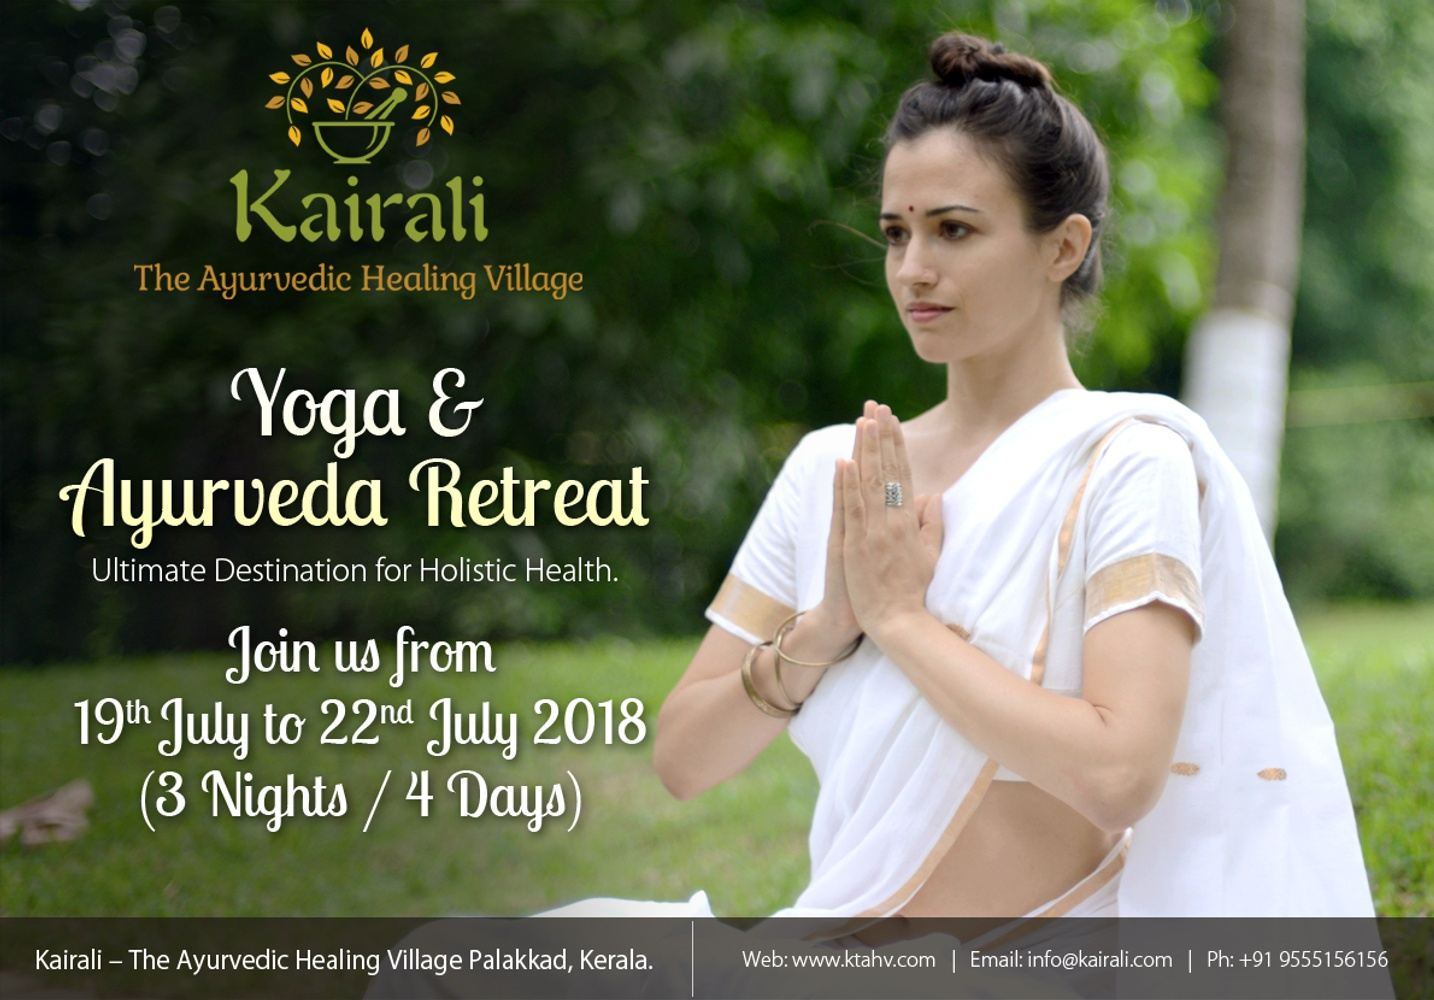 Yoga and Ayurveda retreat at the Kairali Ayurvedic Healing Village